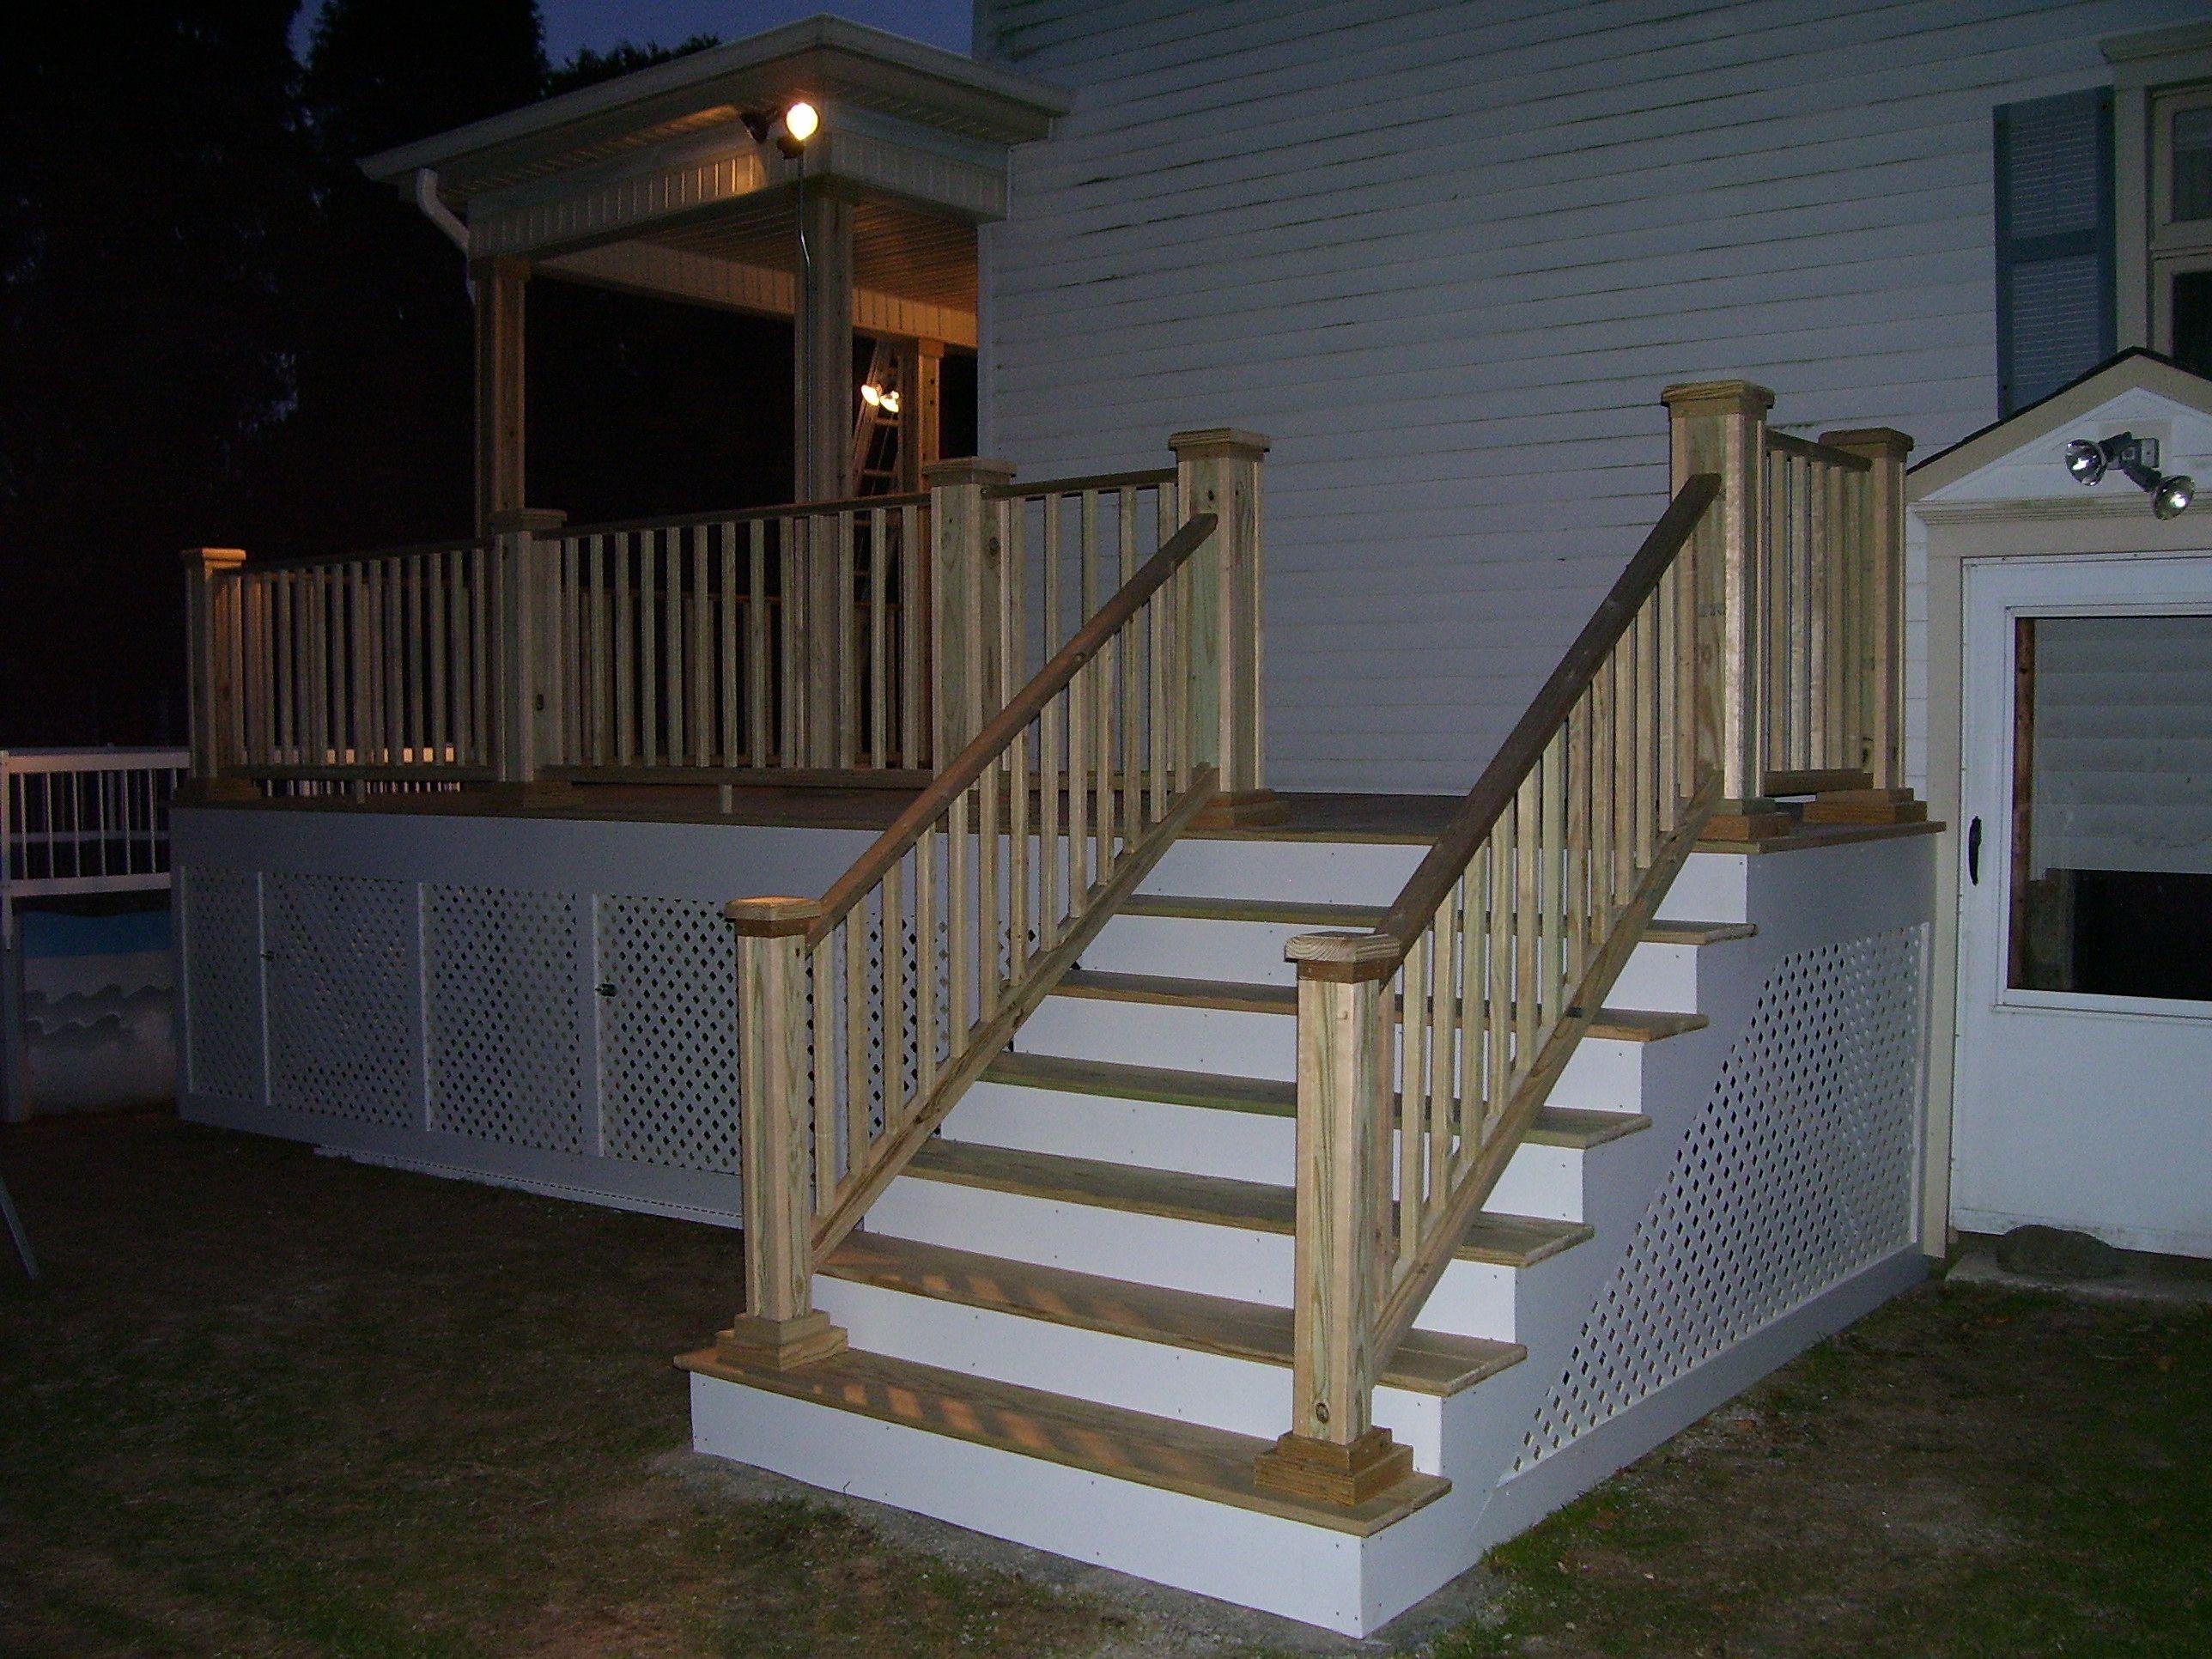 All pressure treated deck with vinyl lattice enclosure the porch